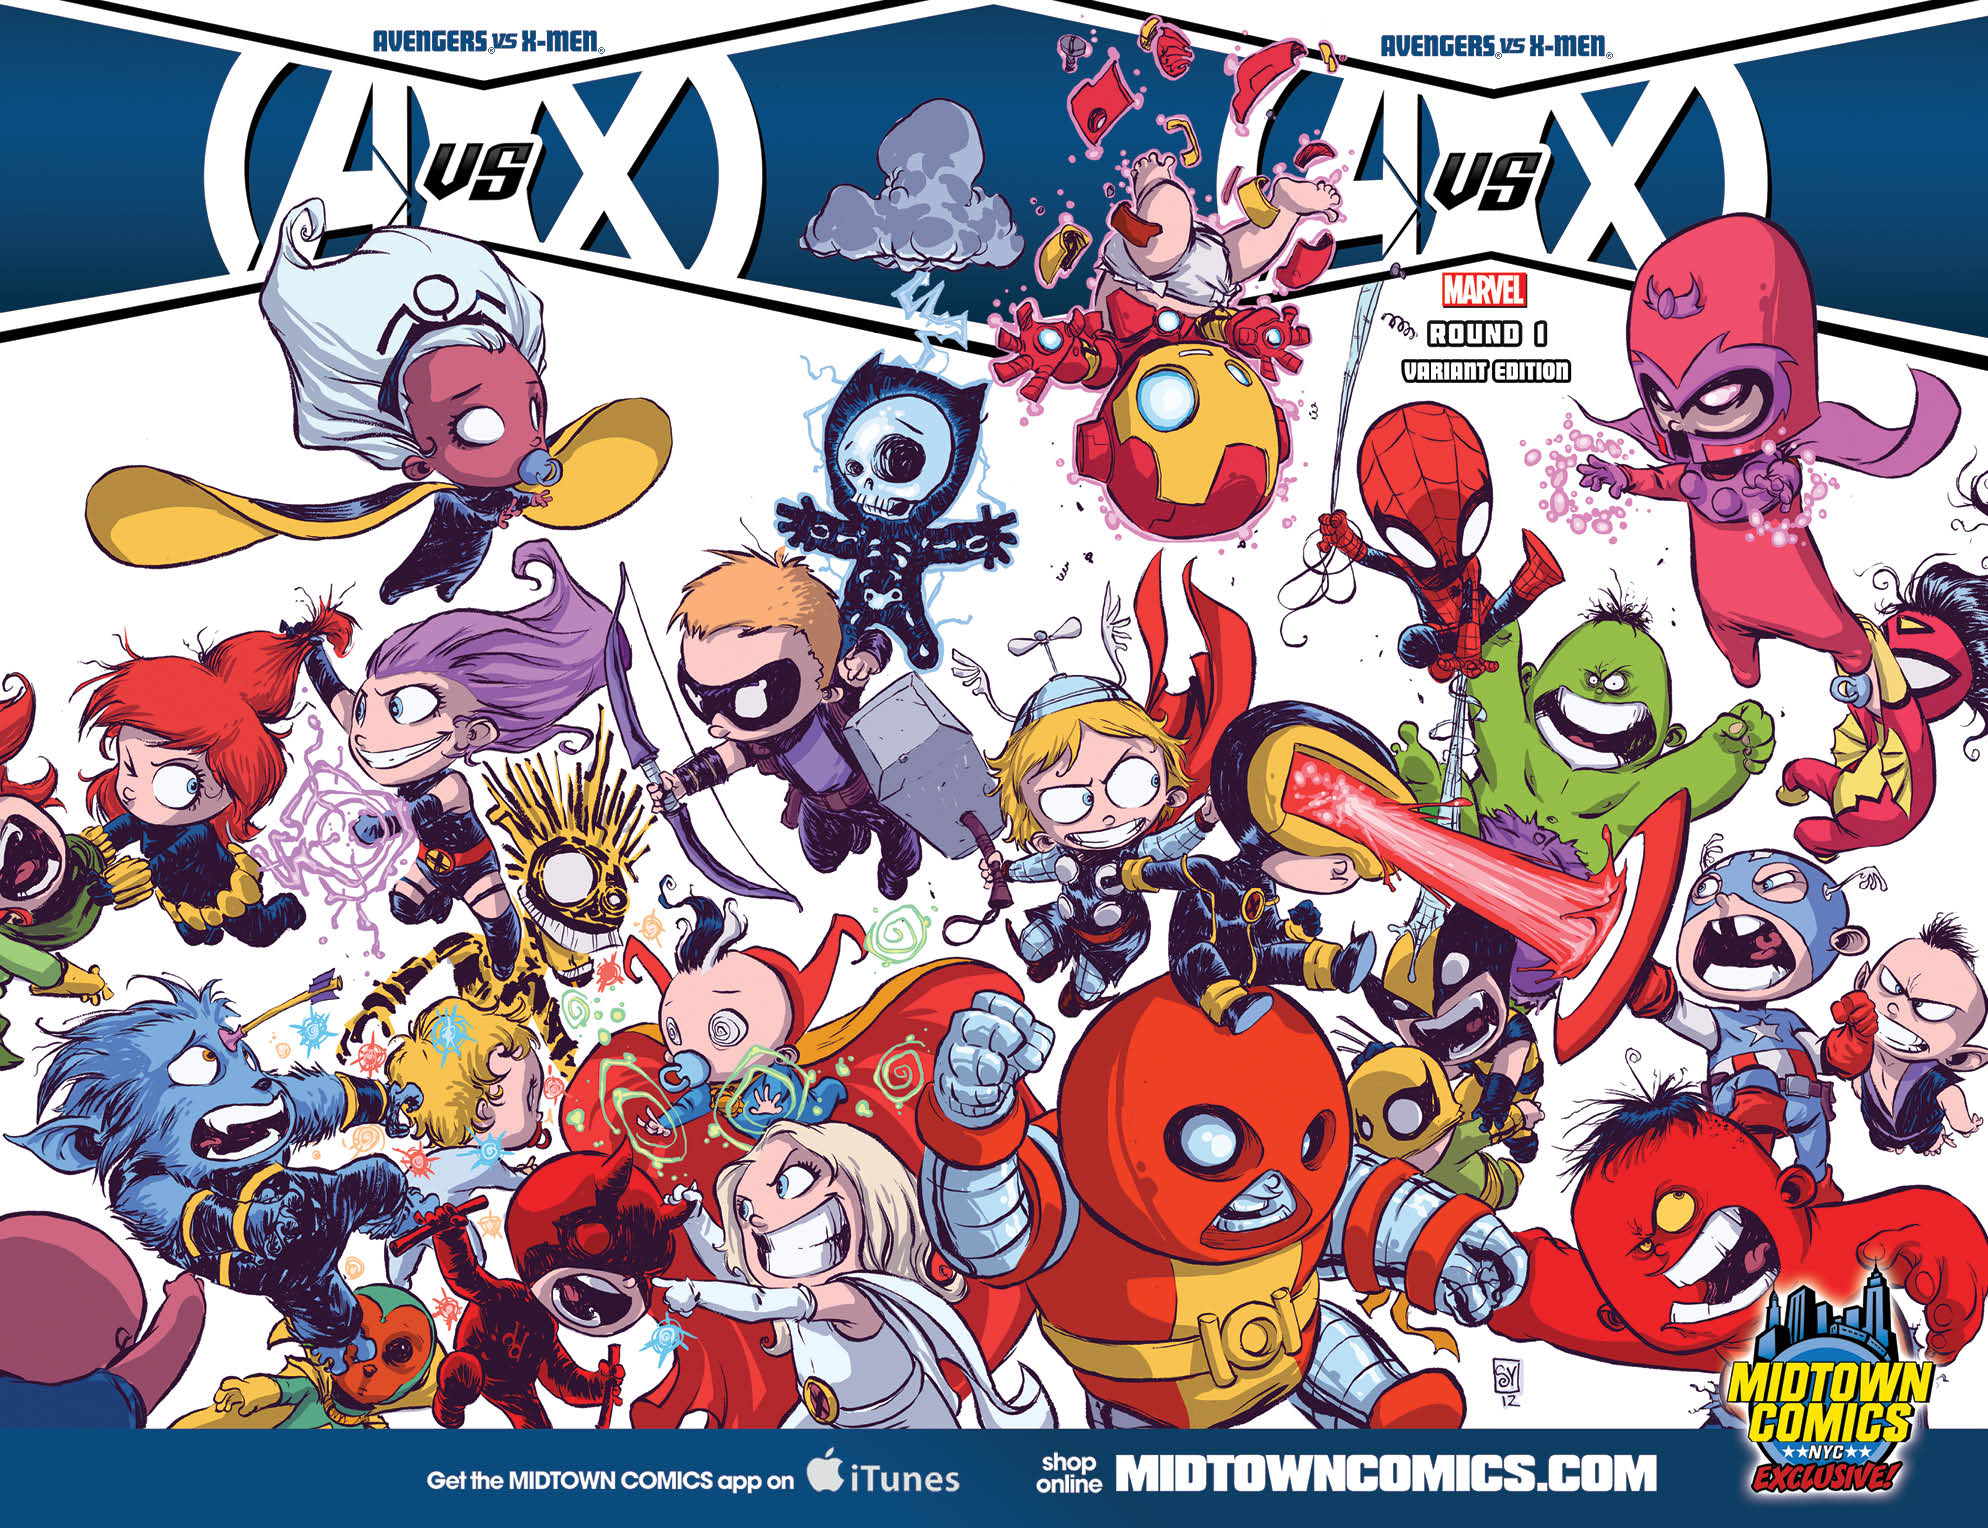 Download Wallpaper Marvel Juggernaut - 382582  Trends_31770.jpg